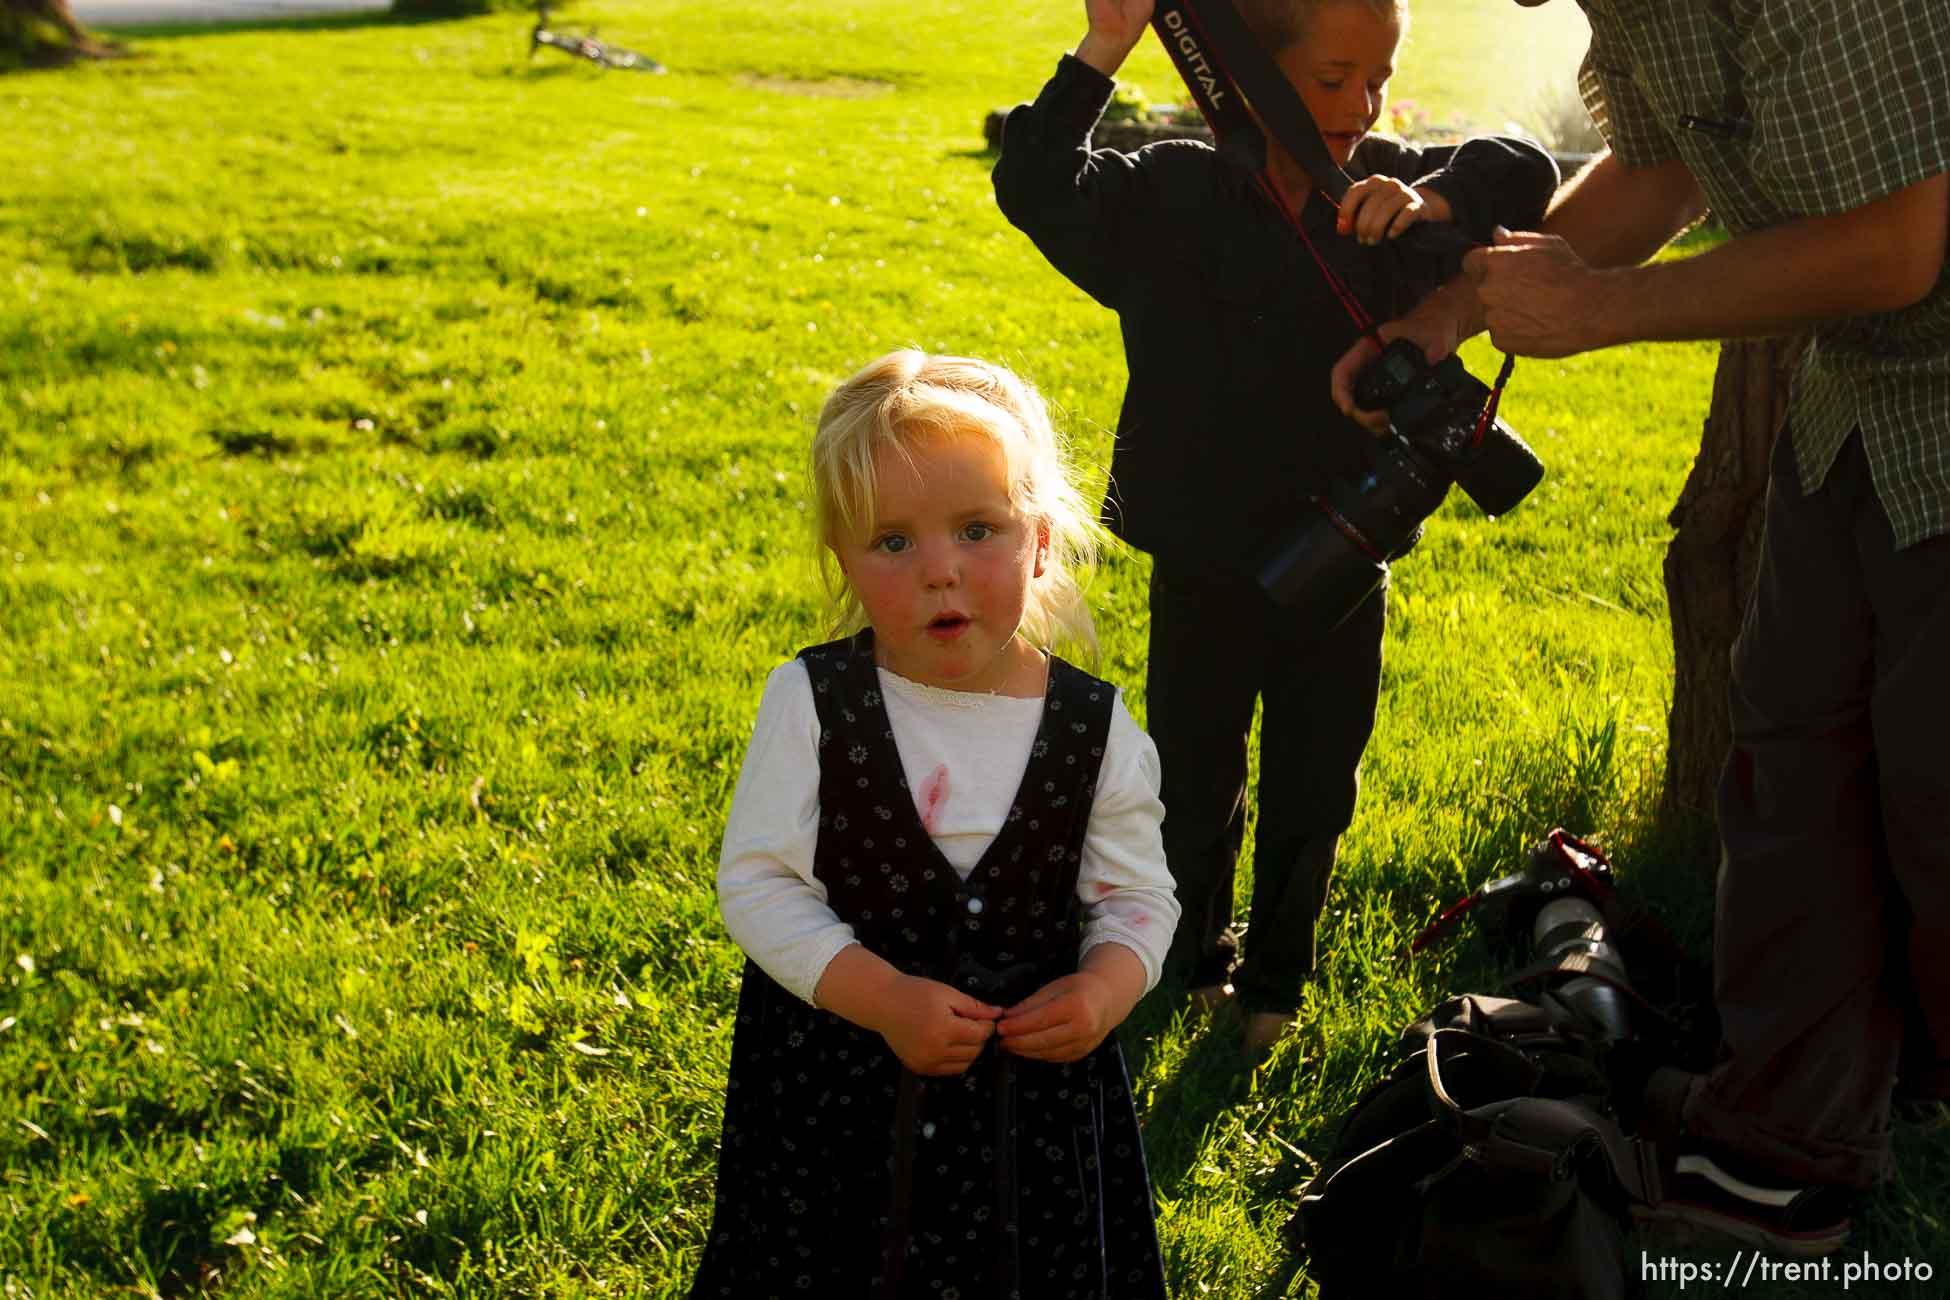 Photos by Blackmore children; 5.17.2006. Trent Nelson